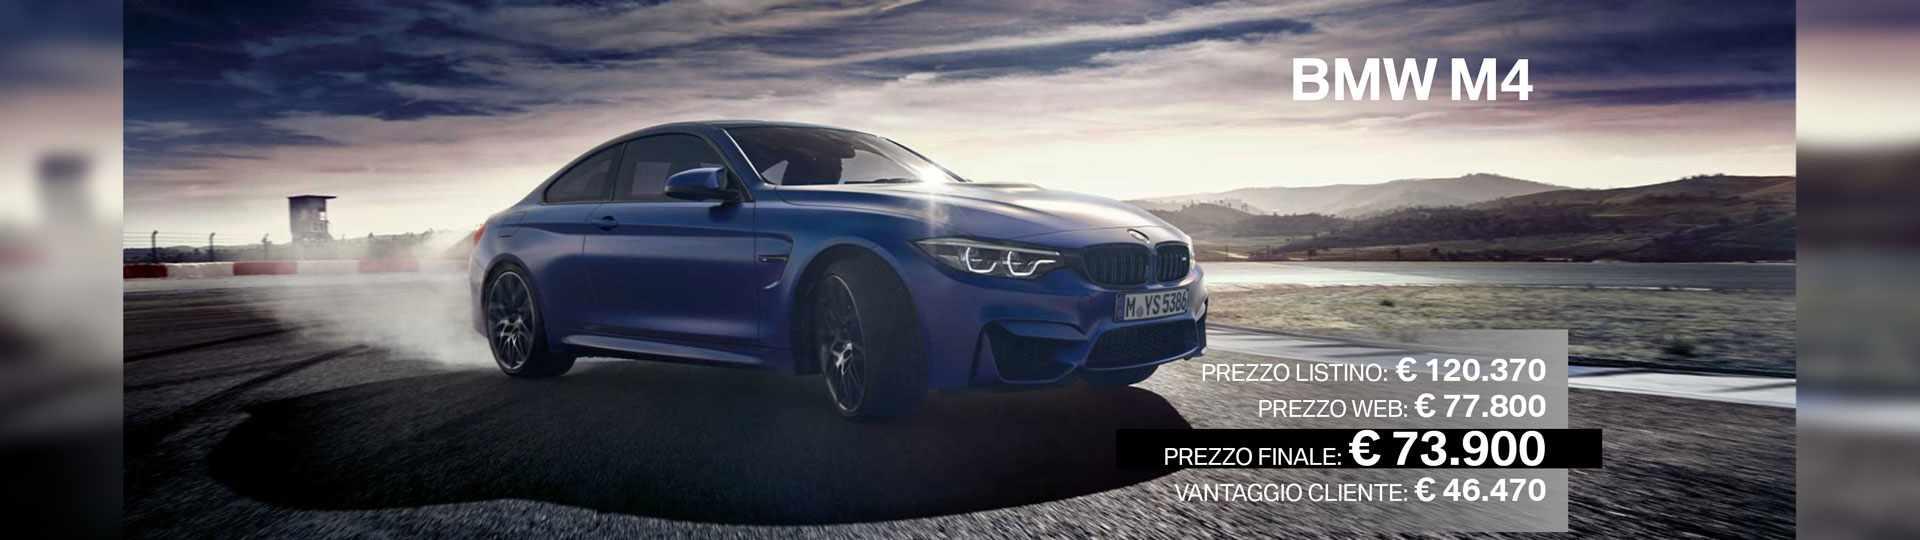 BMW-M4_sito-min.jpg